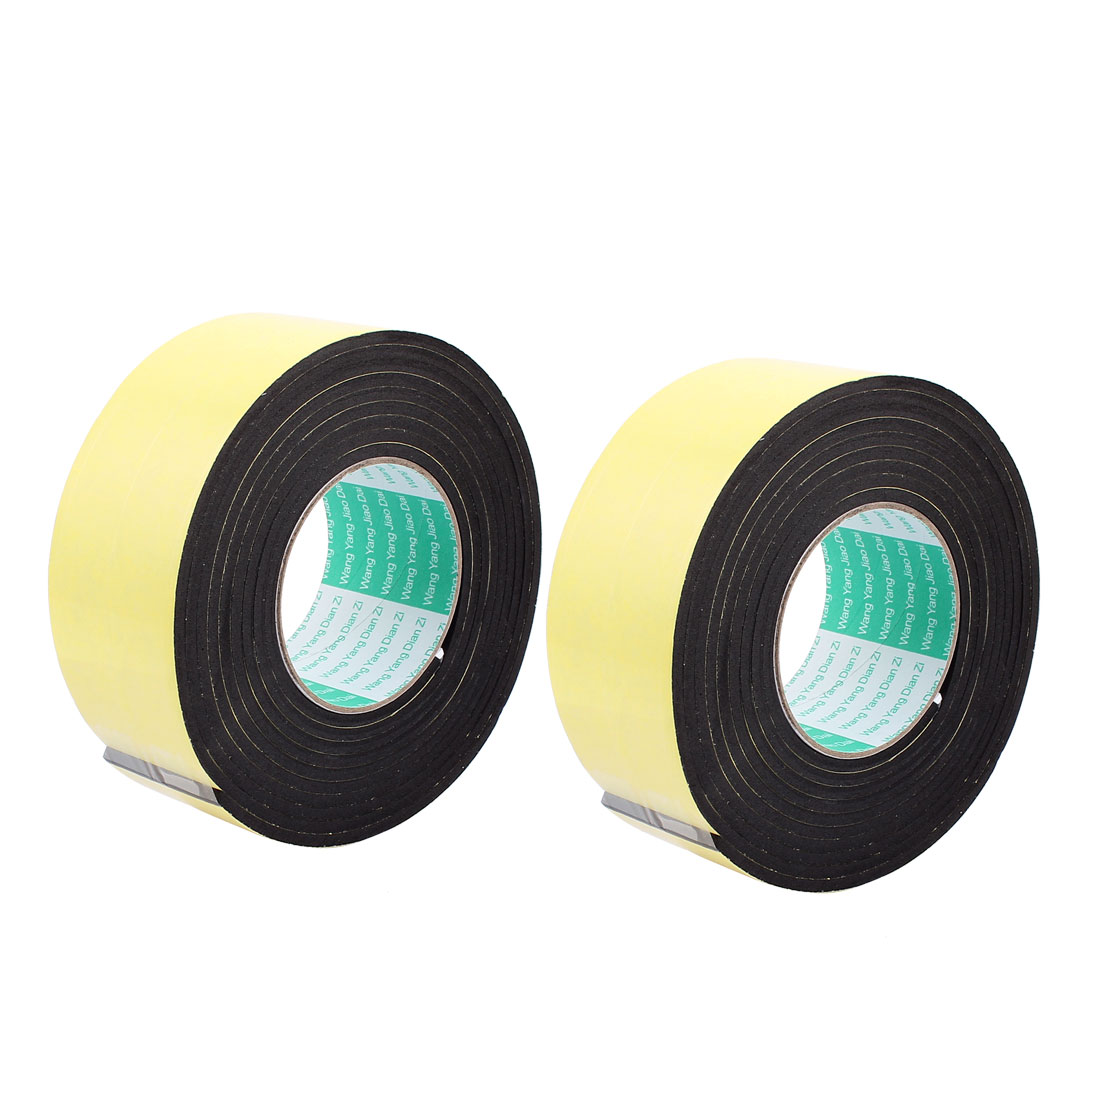 2 Pcs 6CM Width 3 Meters Length 4MM Thick Single Sided Sealing Shockproof Sponge Tape